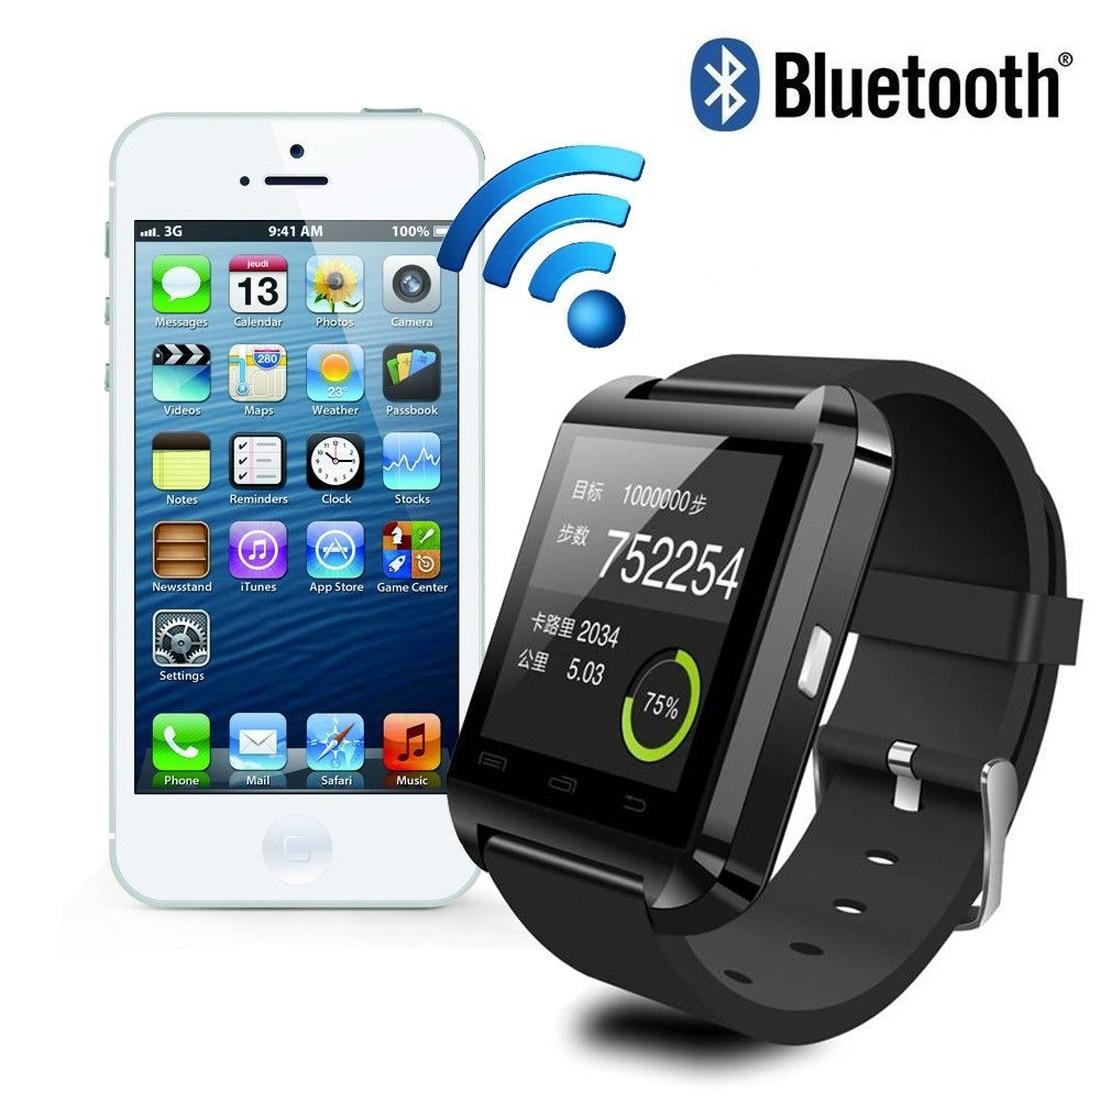 Smart έξυπνη οθόνη ρολογιού U8 Smartwatch οθόνης αφής για iPhone 4 / 4S / 5 / 5S / 6 και Samsung S4 / Σημείωση / s6 HTC Android Smartphone